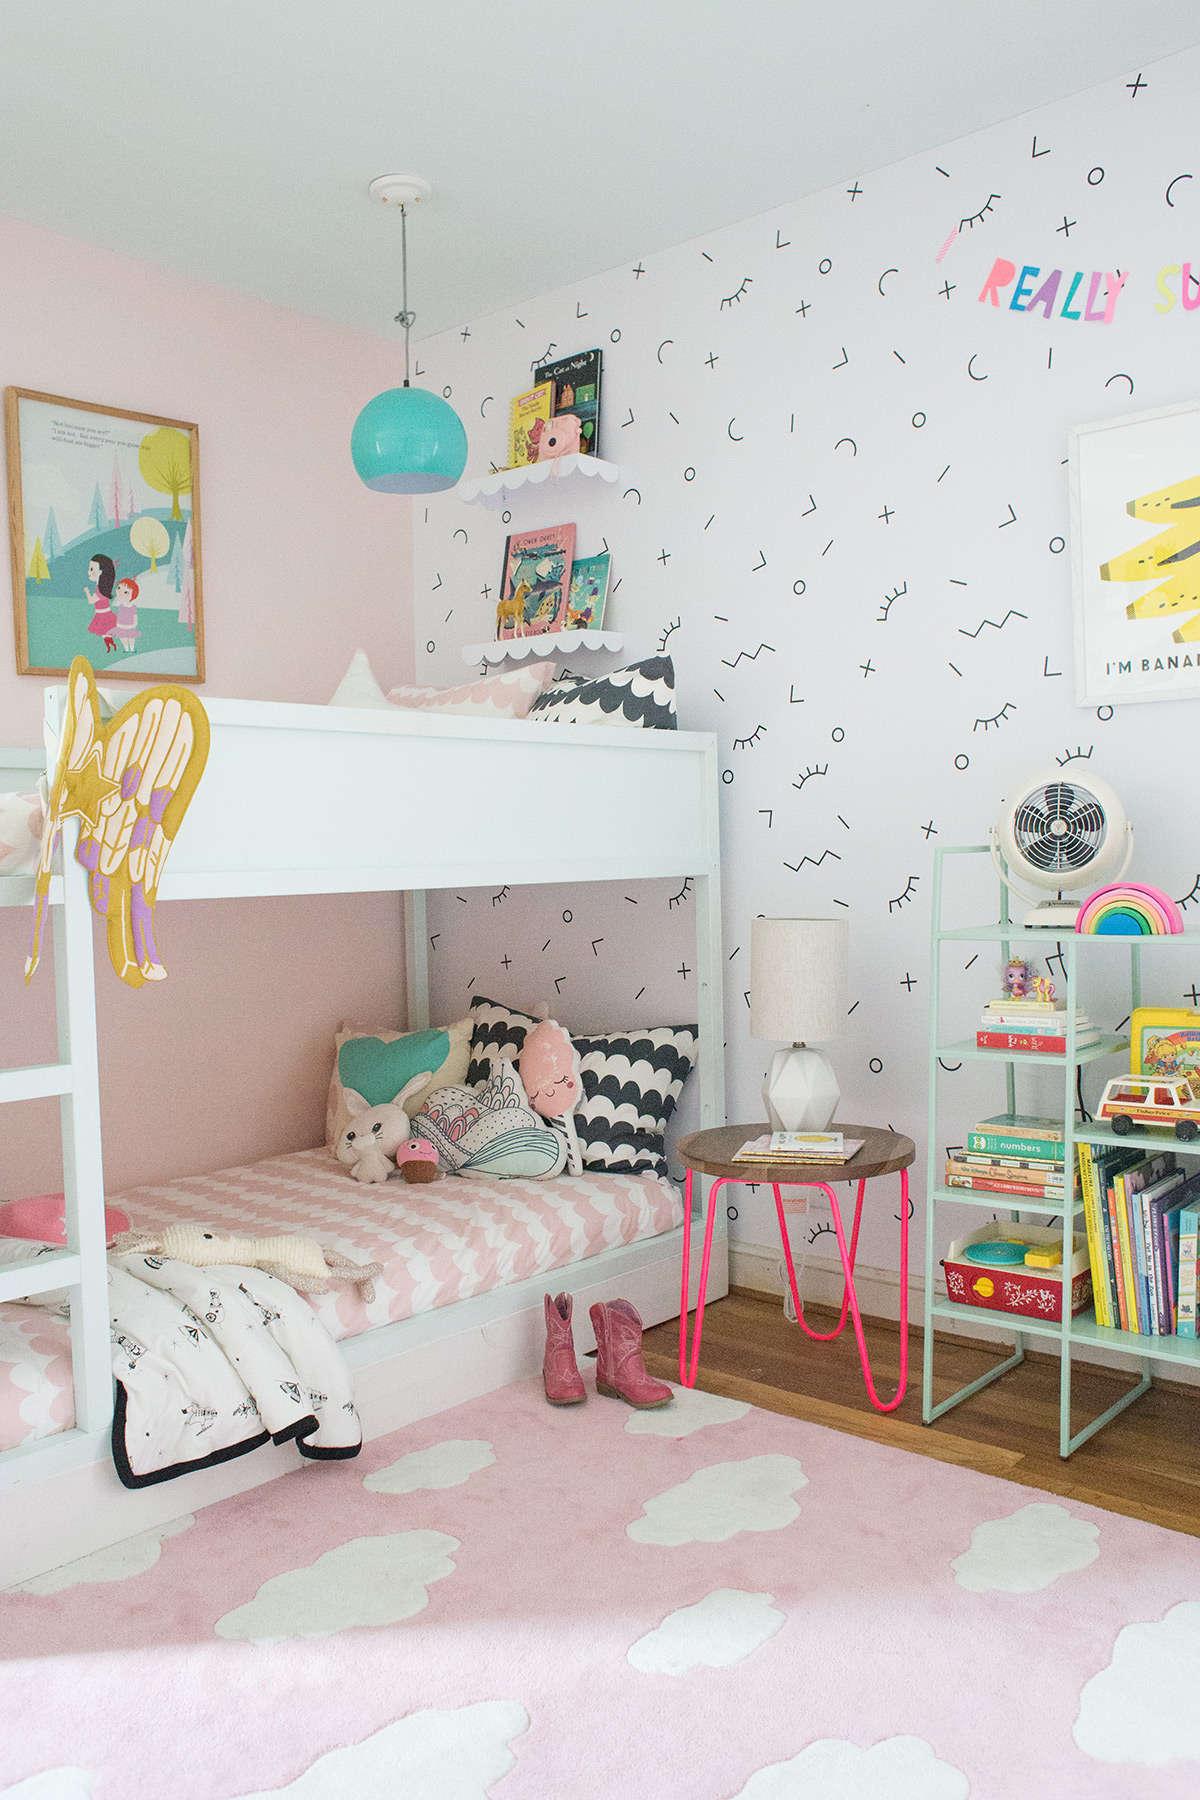 Kawaii Bedroom Ideas Diy Riser For Kura Bunk Bed Lay Baby Lay Lay Baby Lay